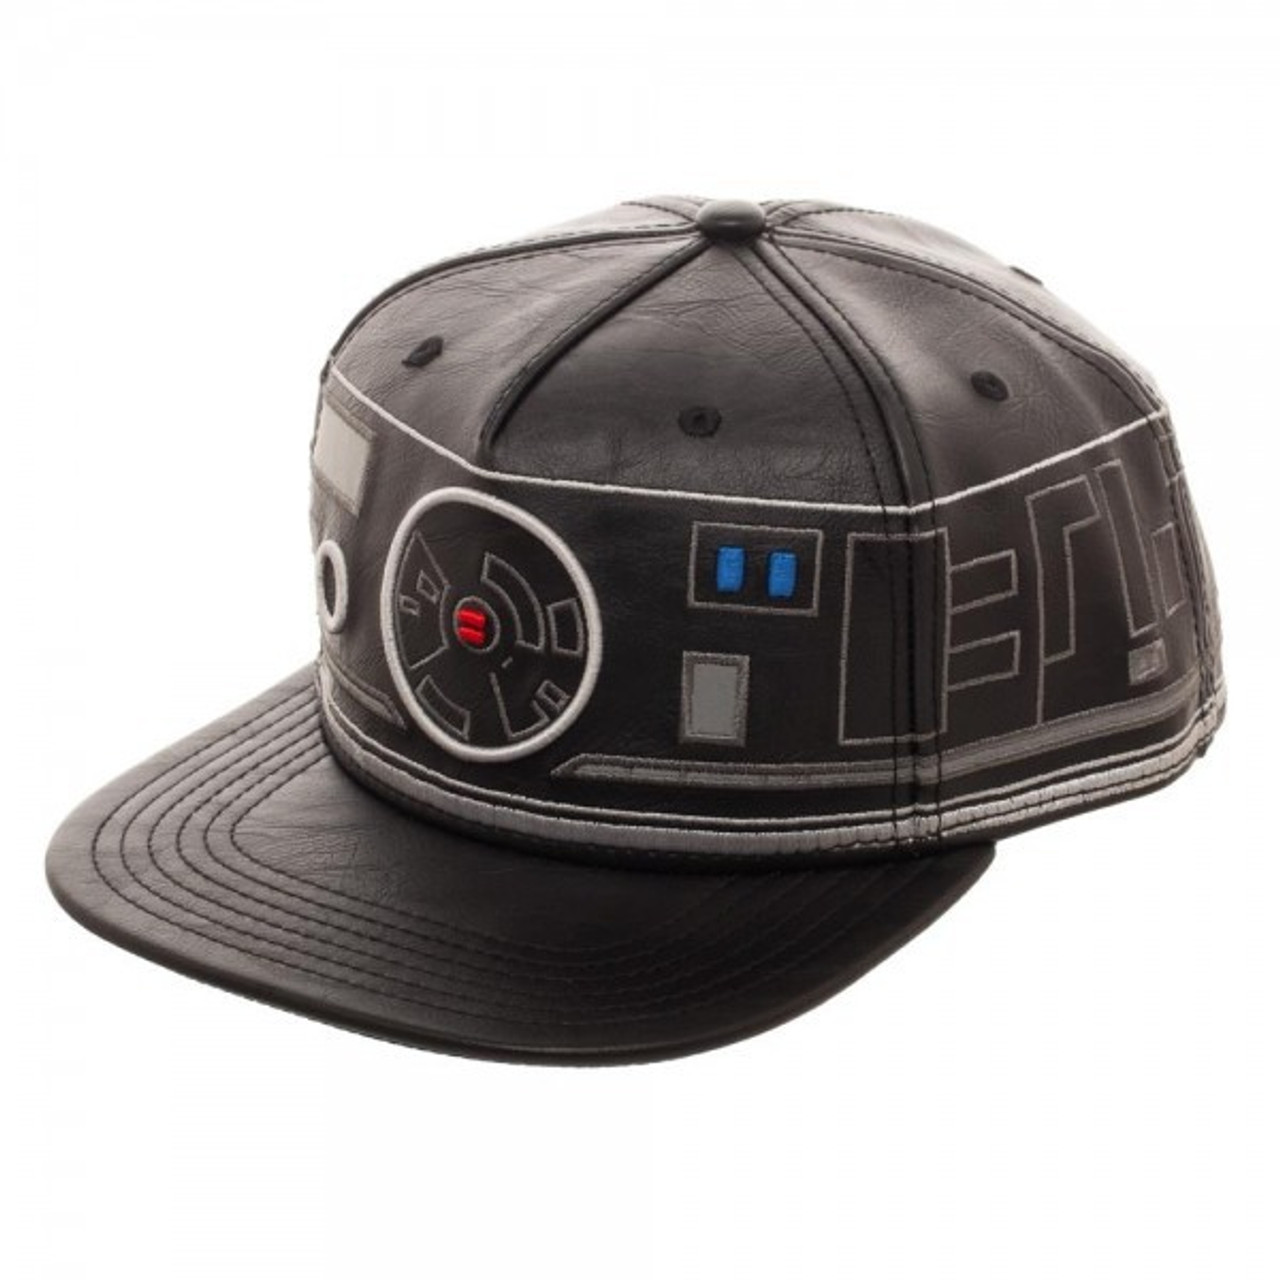 cheaper f9f63 c2304 Star Wars The Last Jedi First Order BB Unit Big Face Embroidered Faux  Leather Snapback Cap Hat Apparel Bioworld - ToyWiz